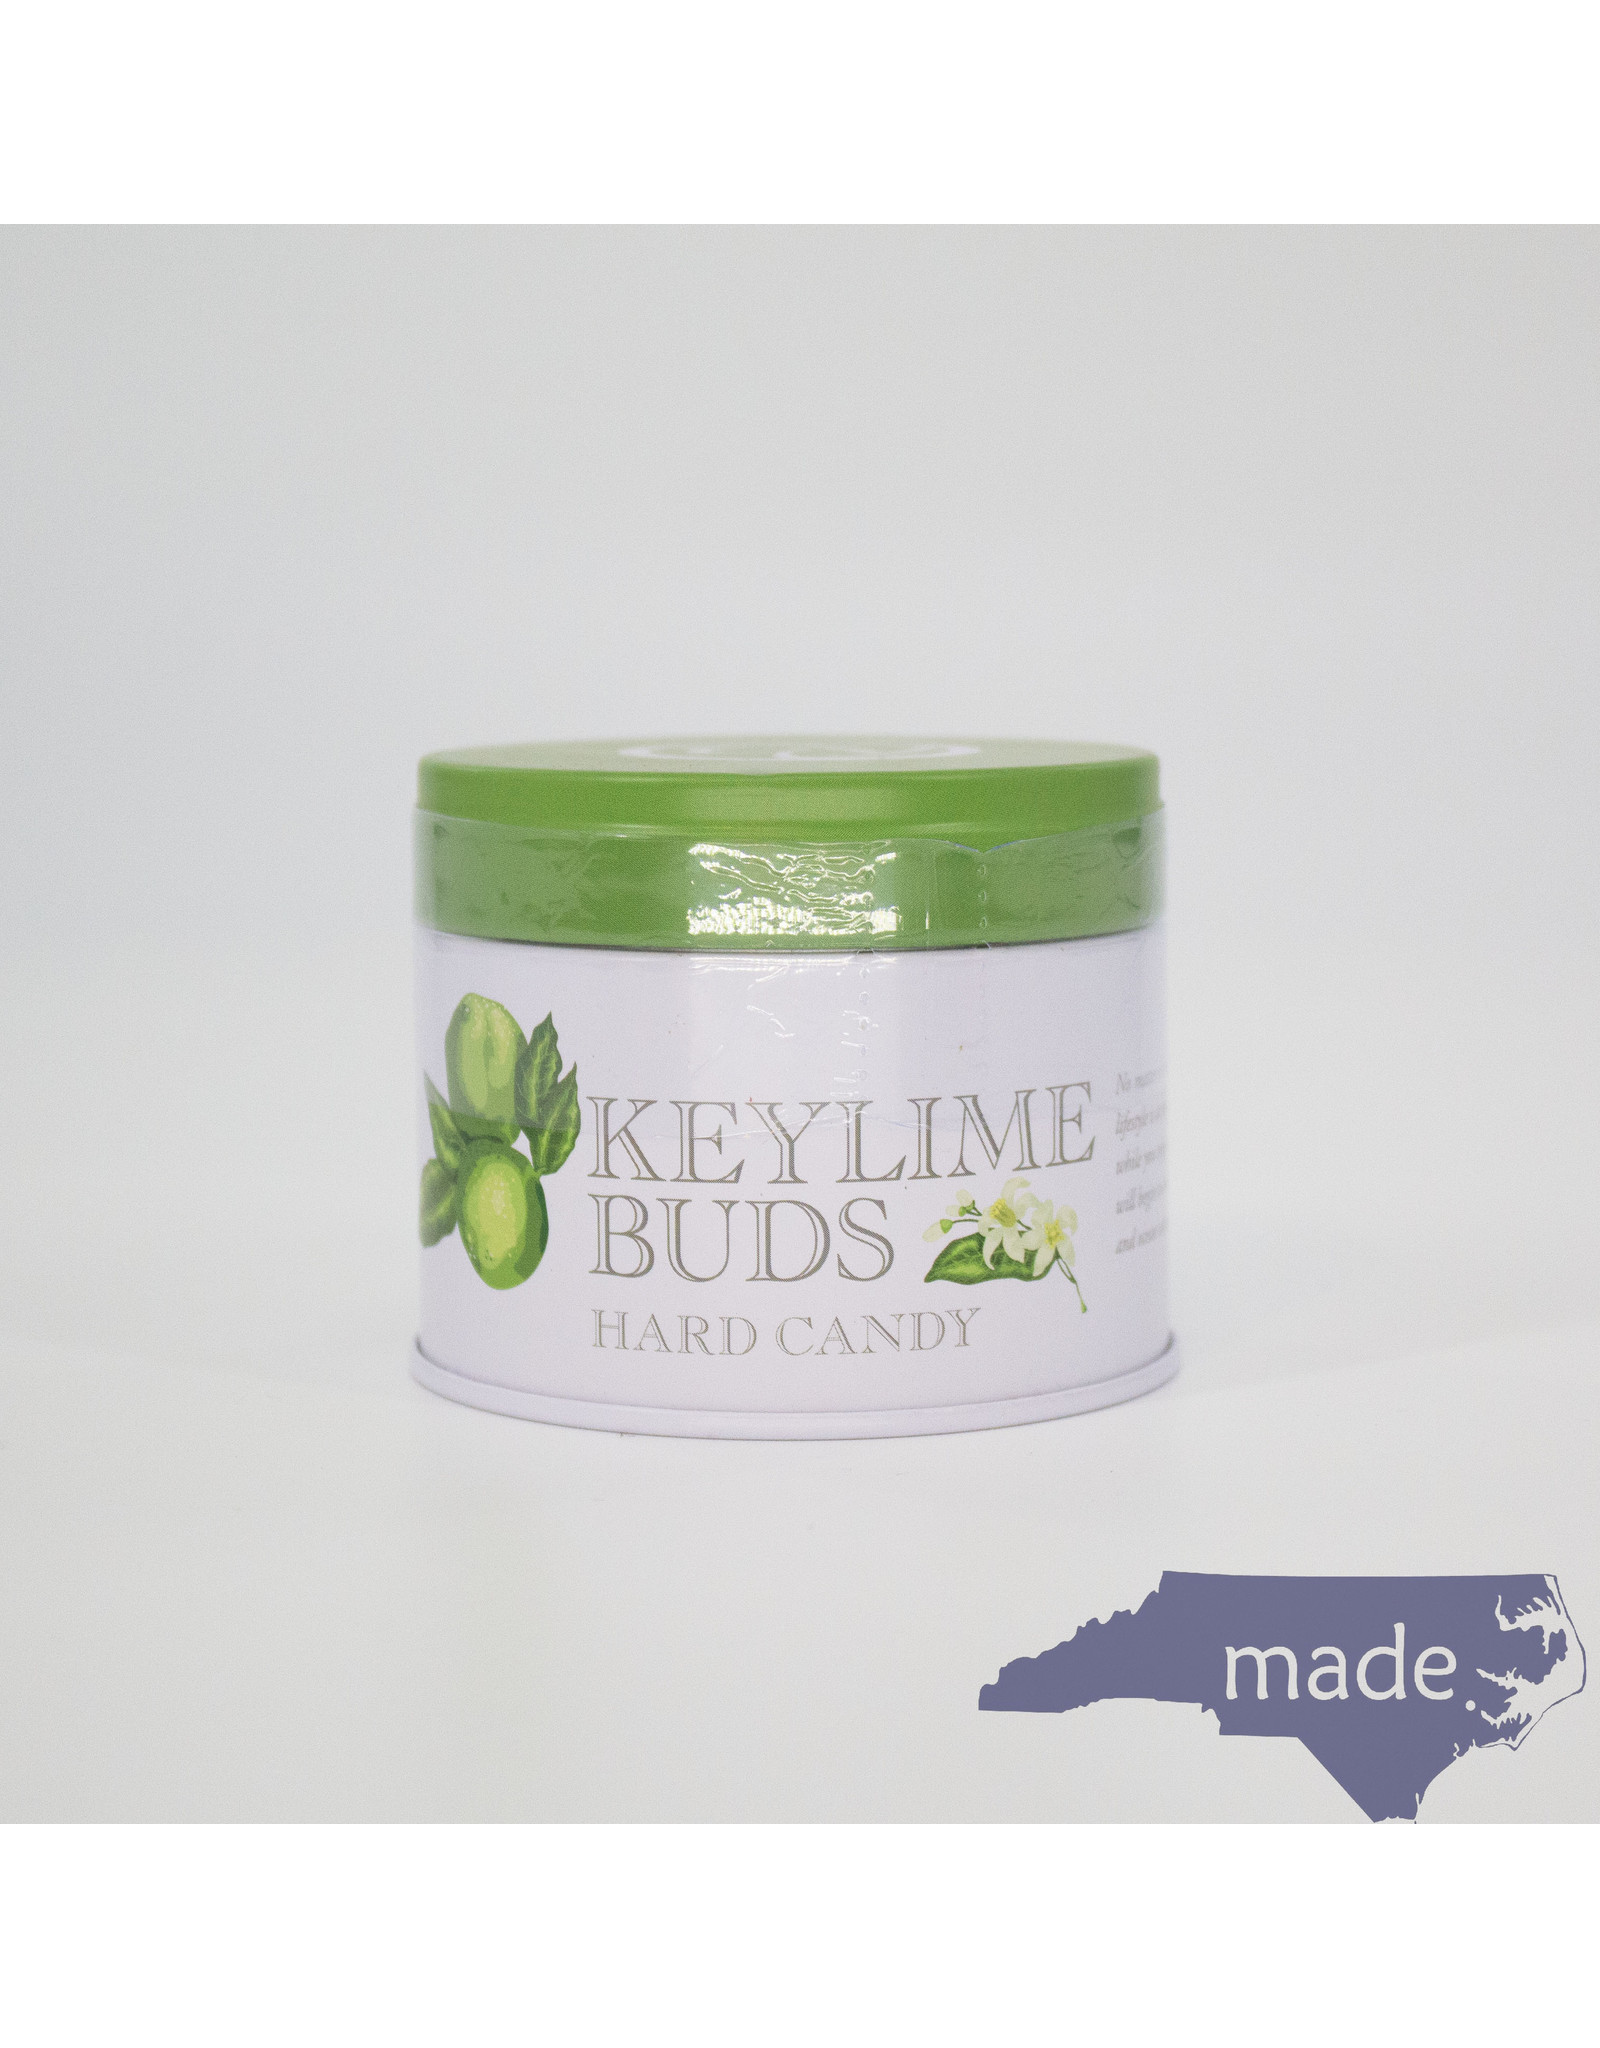 Butterfields Candy Key Lime Buds 3.5 oz. - Butterfields Candy